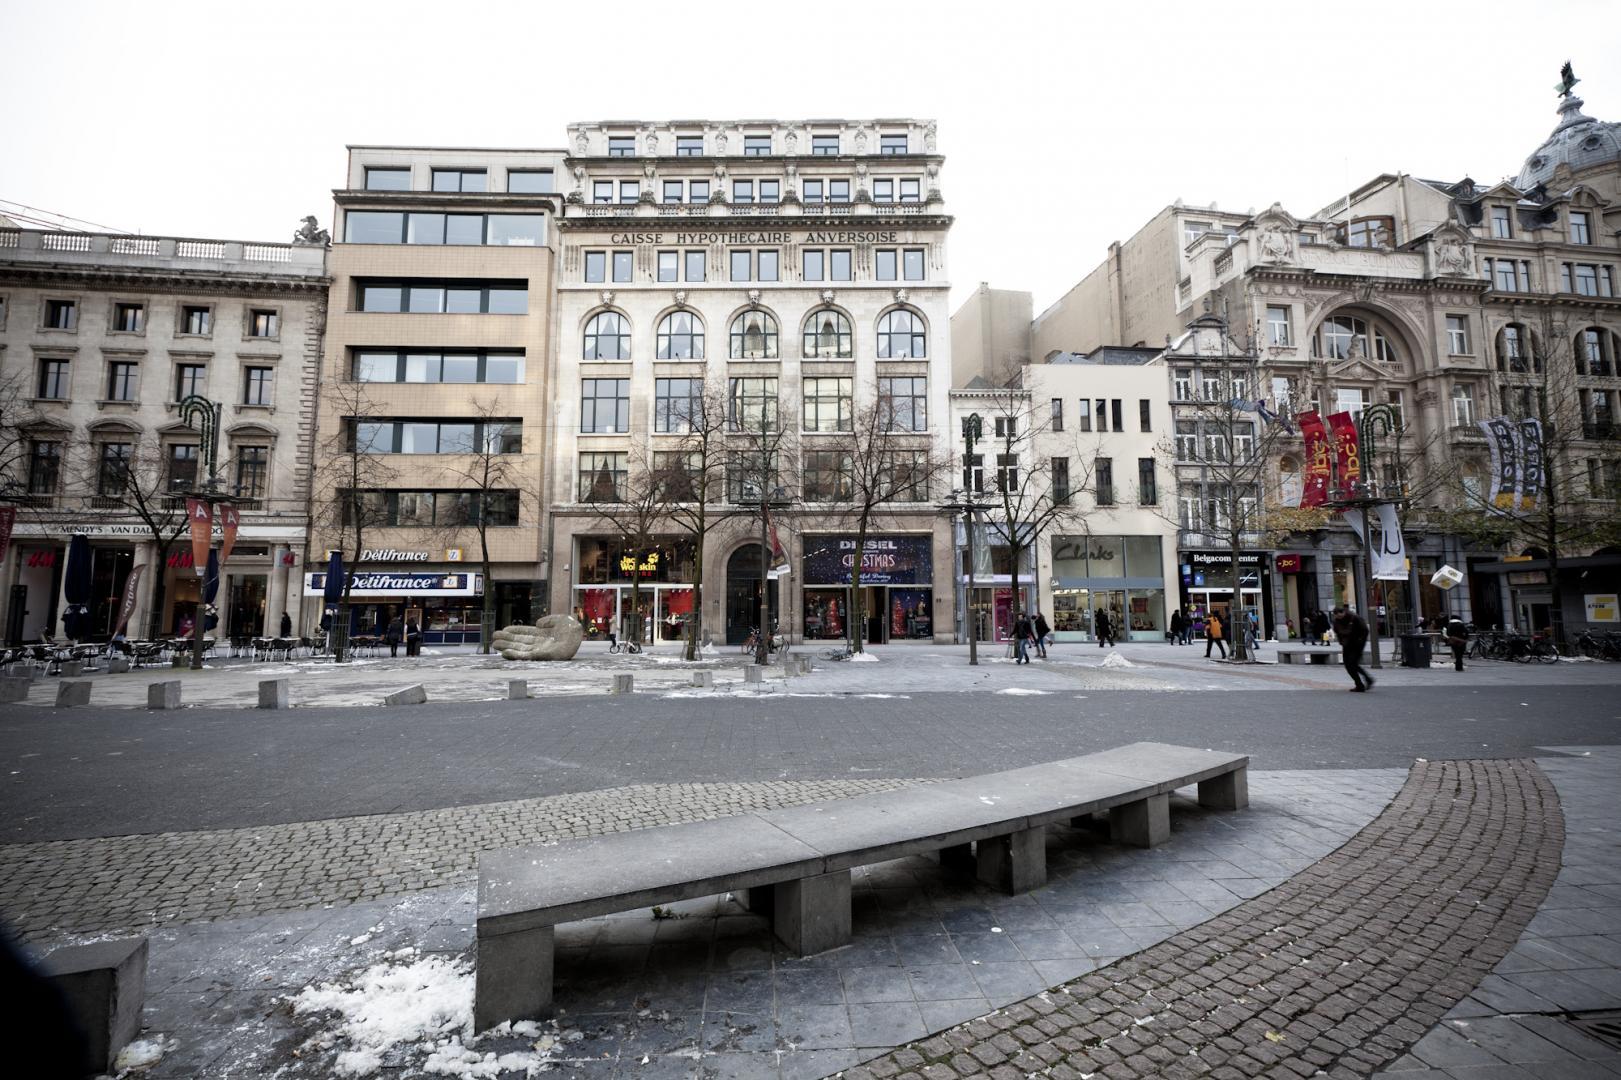 Octrooi -en merkenbureau in Antwerpen